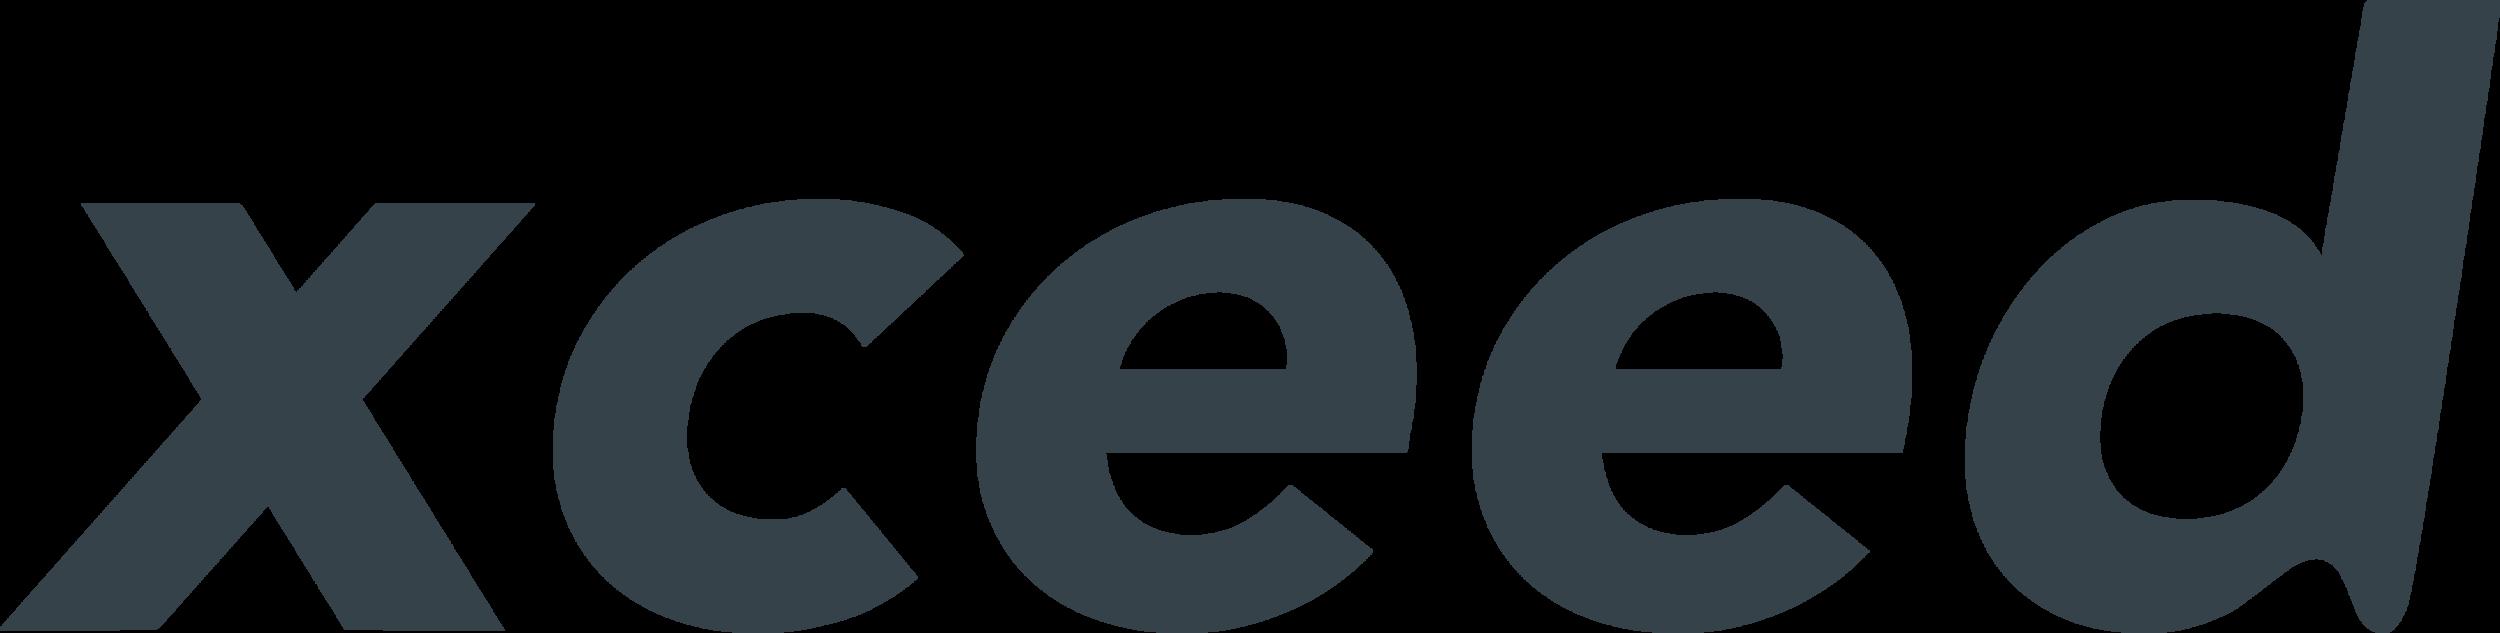 Xceed Logo Black.png